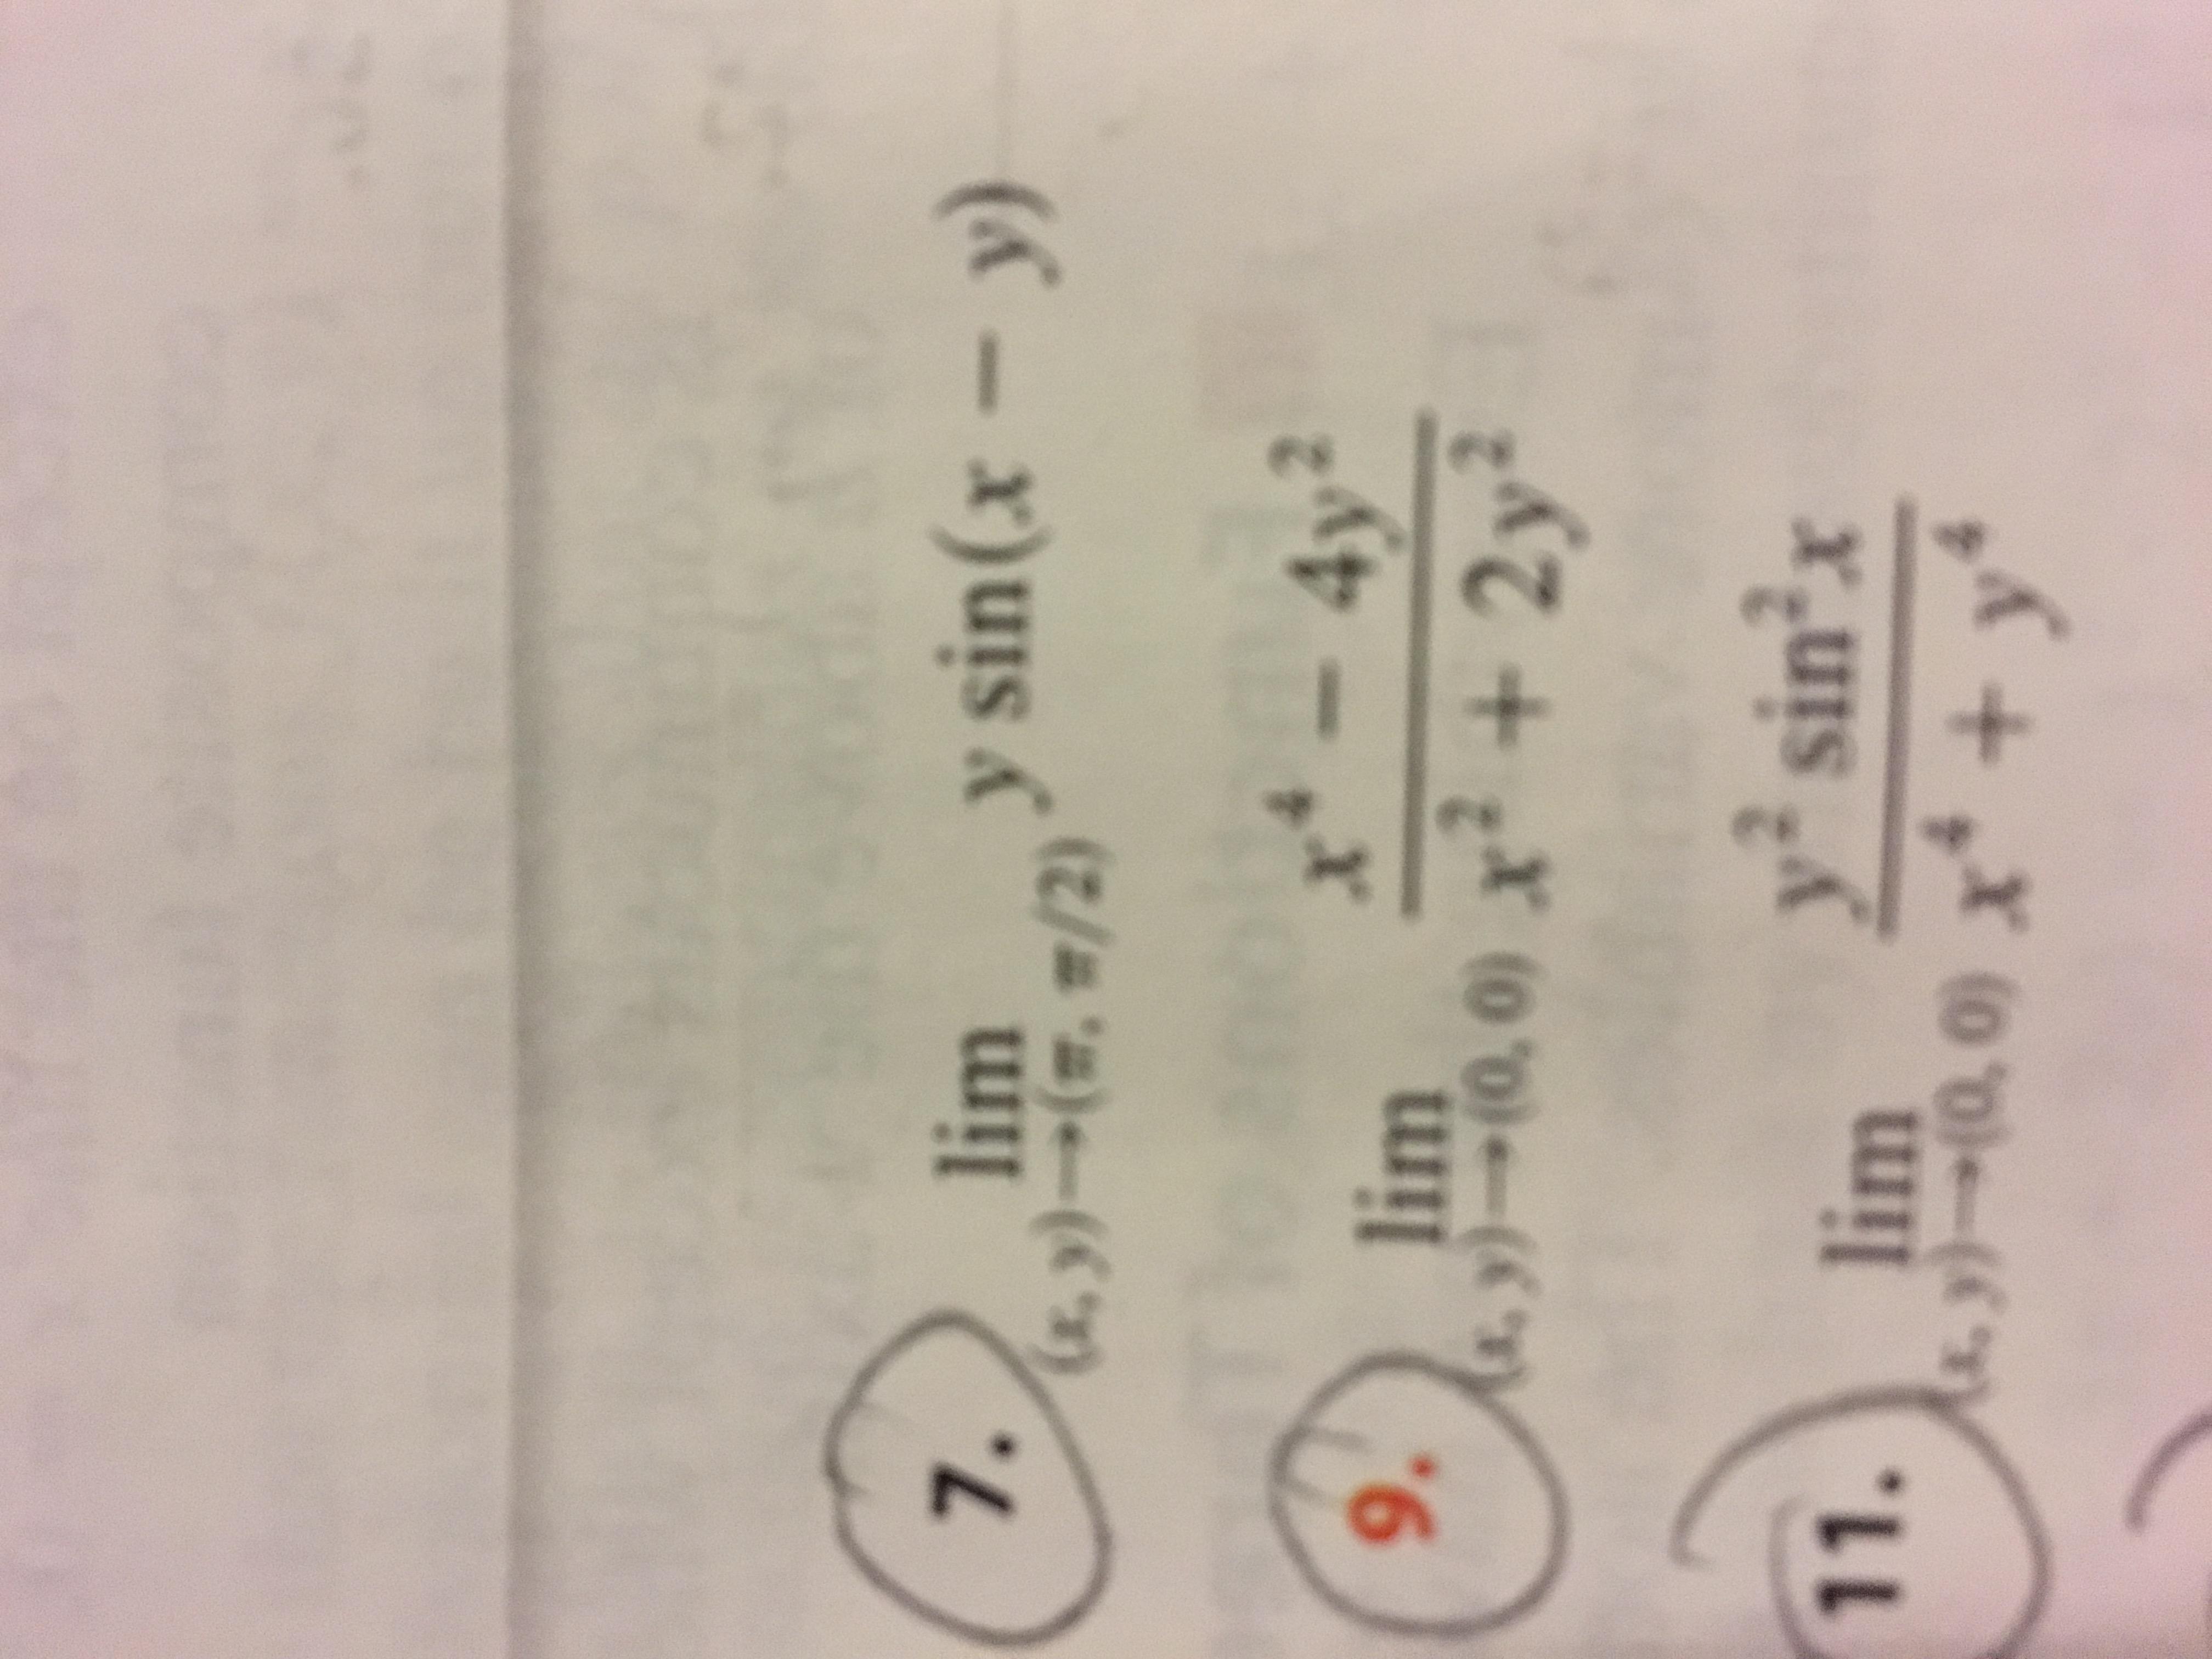 7. lim y sin (x - y) (x, y)(, #/2) x-4y2 9. lim s, y)-(0, 0) x+2y y2 sinx lim 11 y)-(0, 0) x+ y